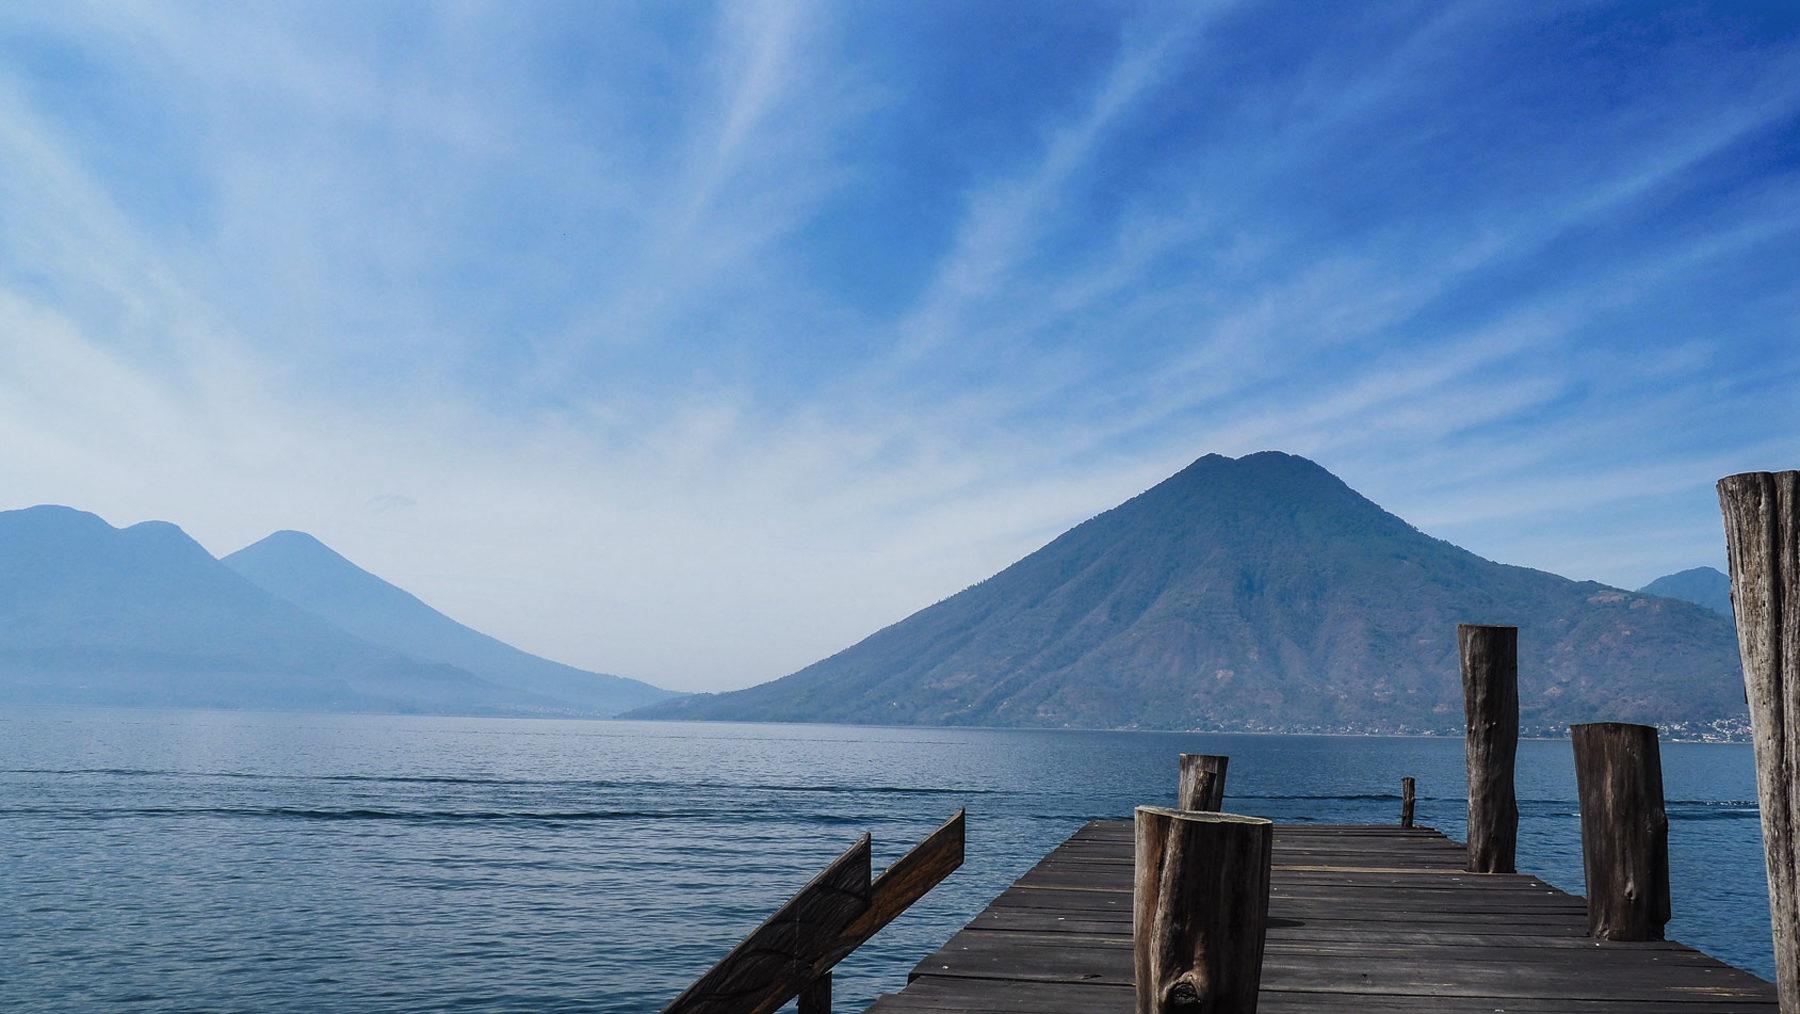 Vulkan San Pedro